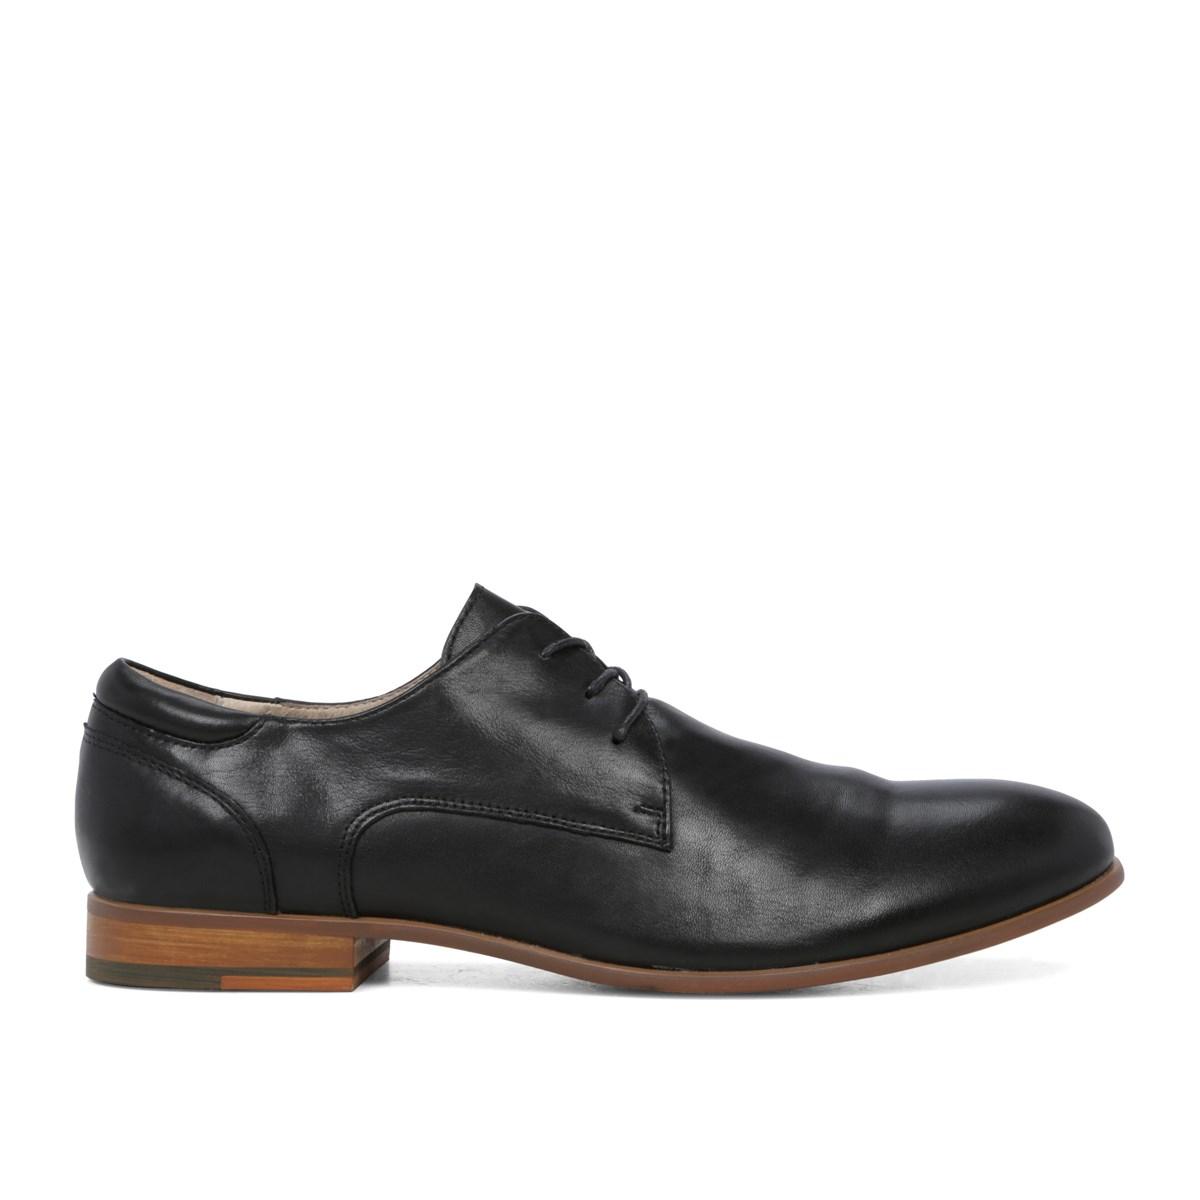 s areria formal lace up black derby shoe burgundy